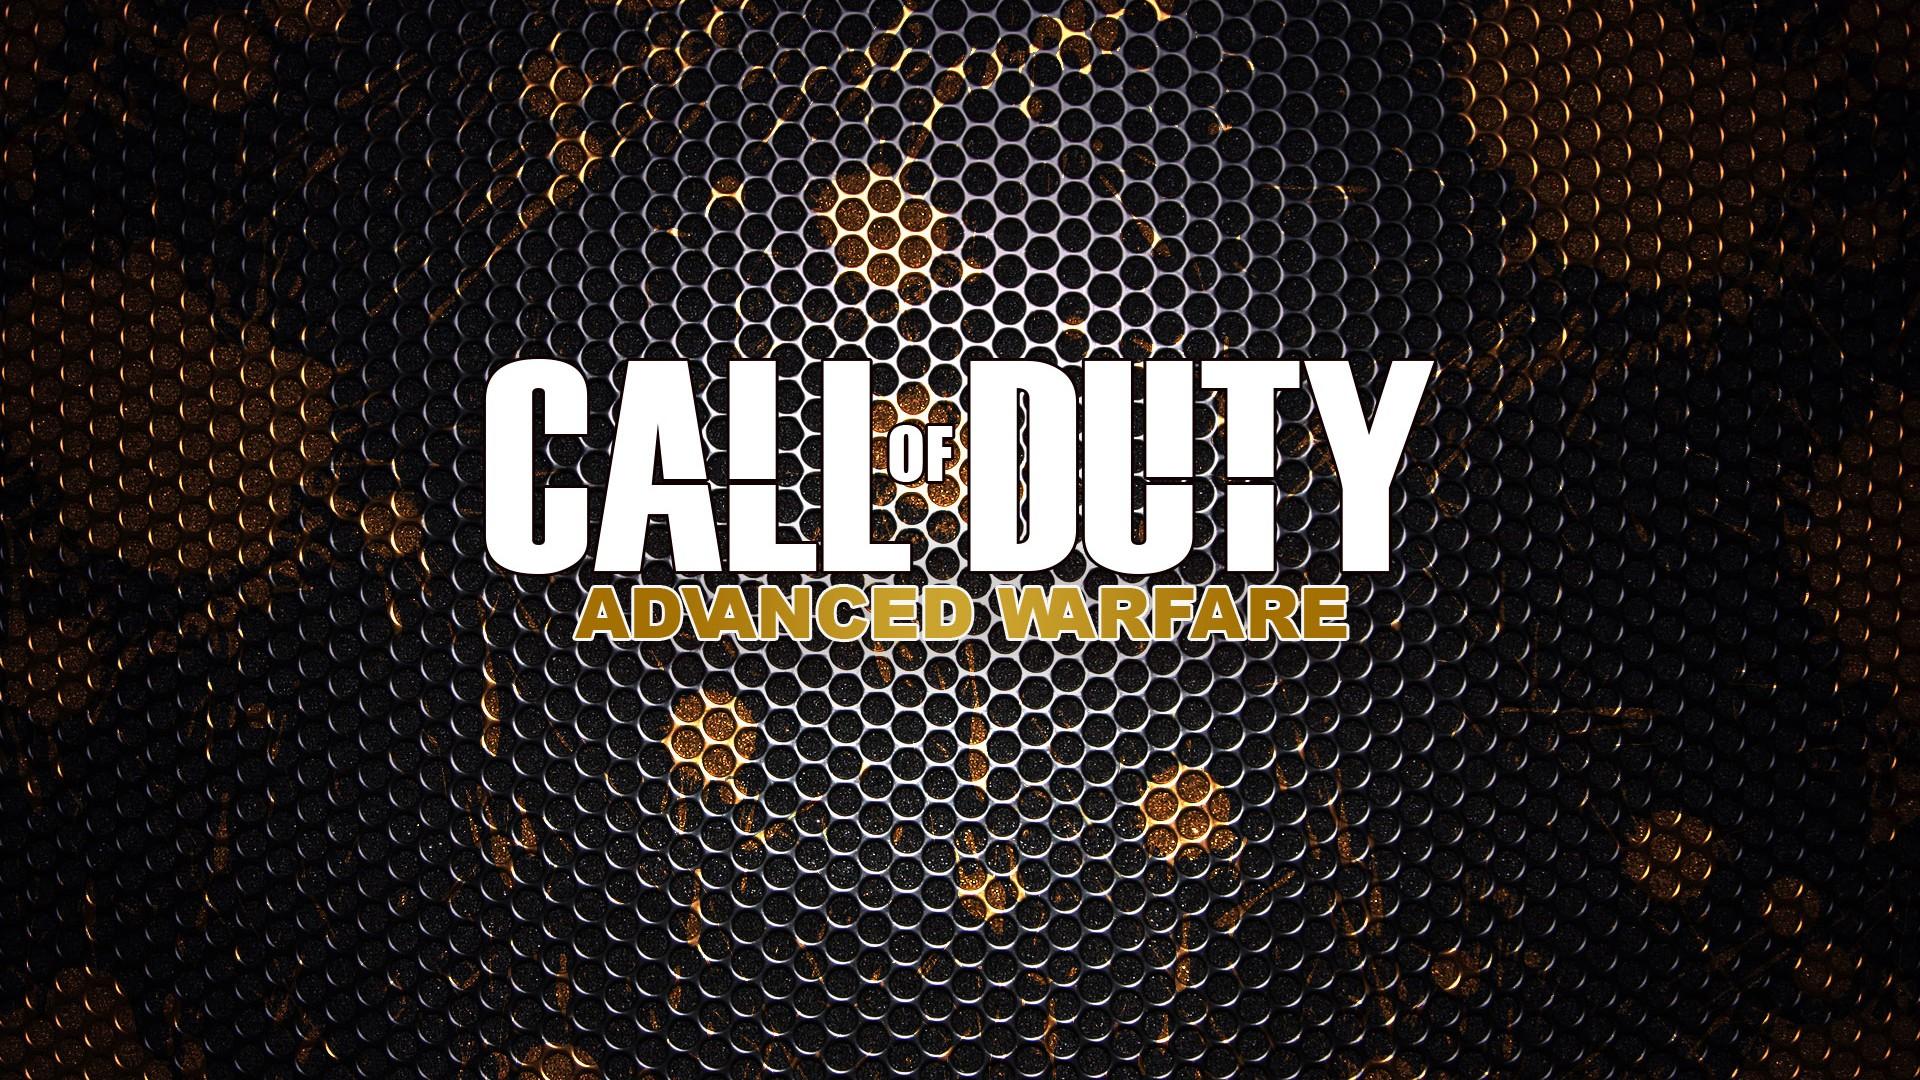 46] Call Of Duty Logo Wallpapers on WallpaperSafari 1920x1080